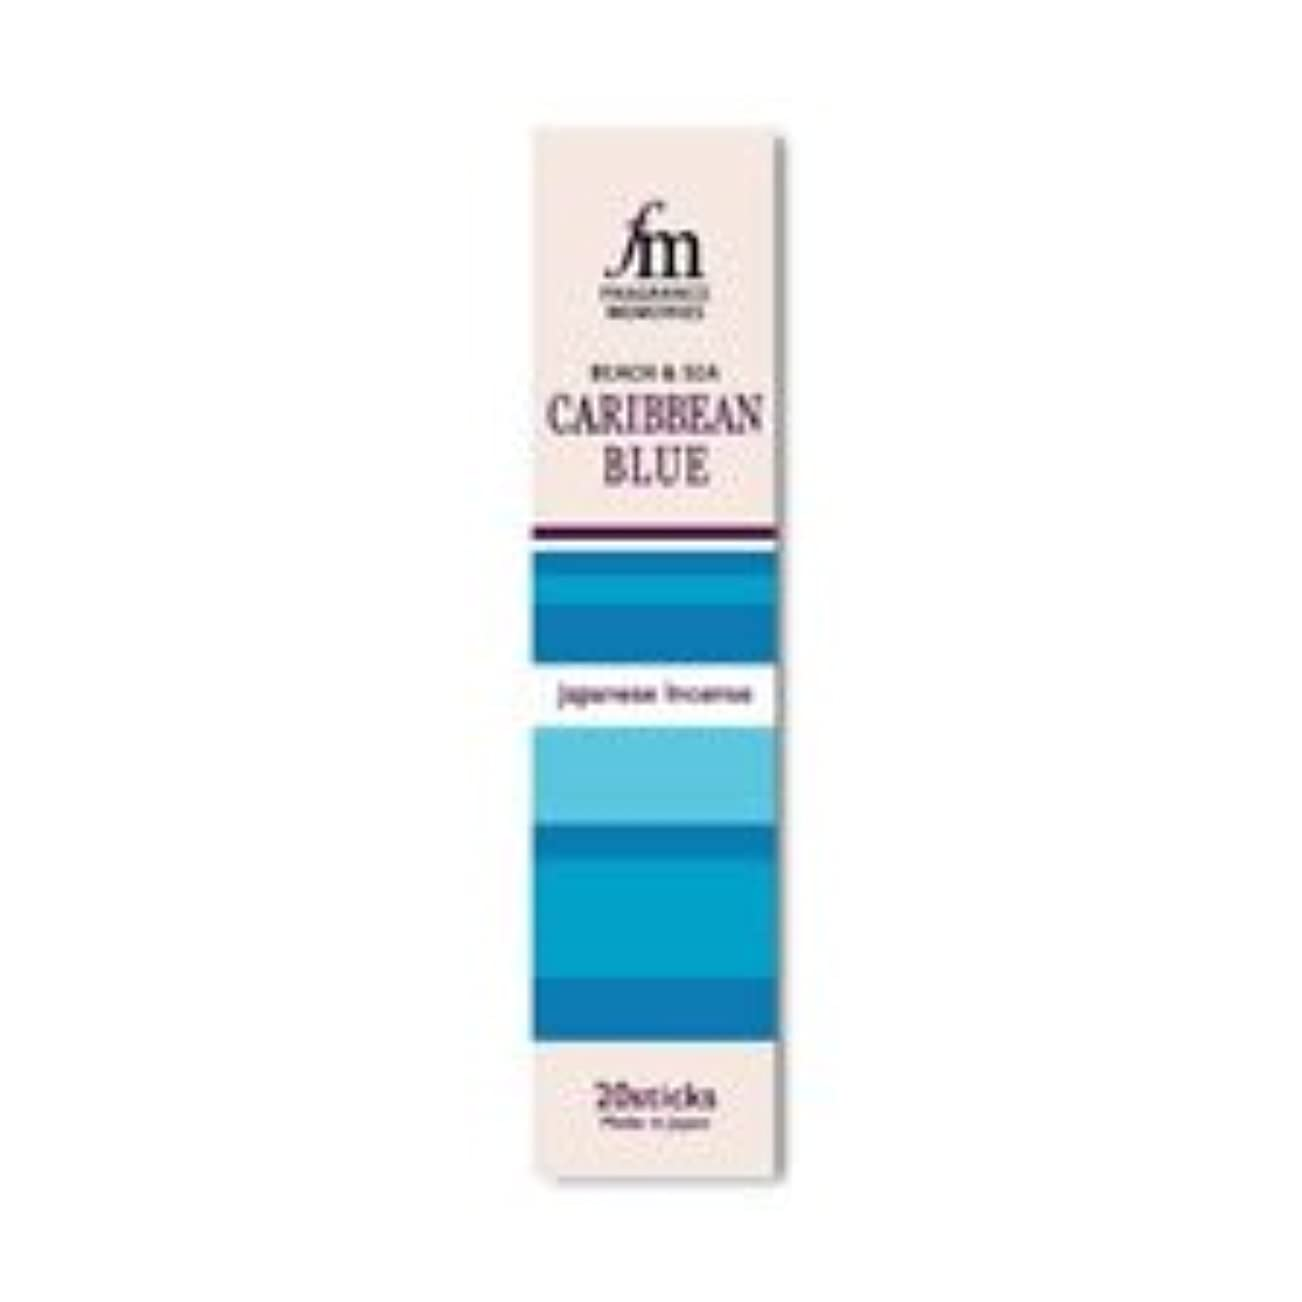 Fragrance Memoriesお香: Caribbean Blue